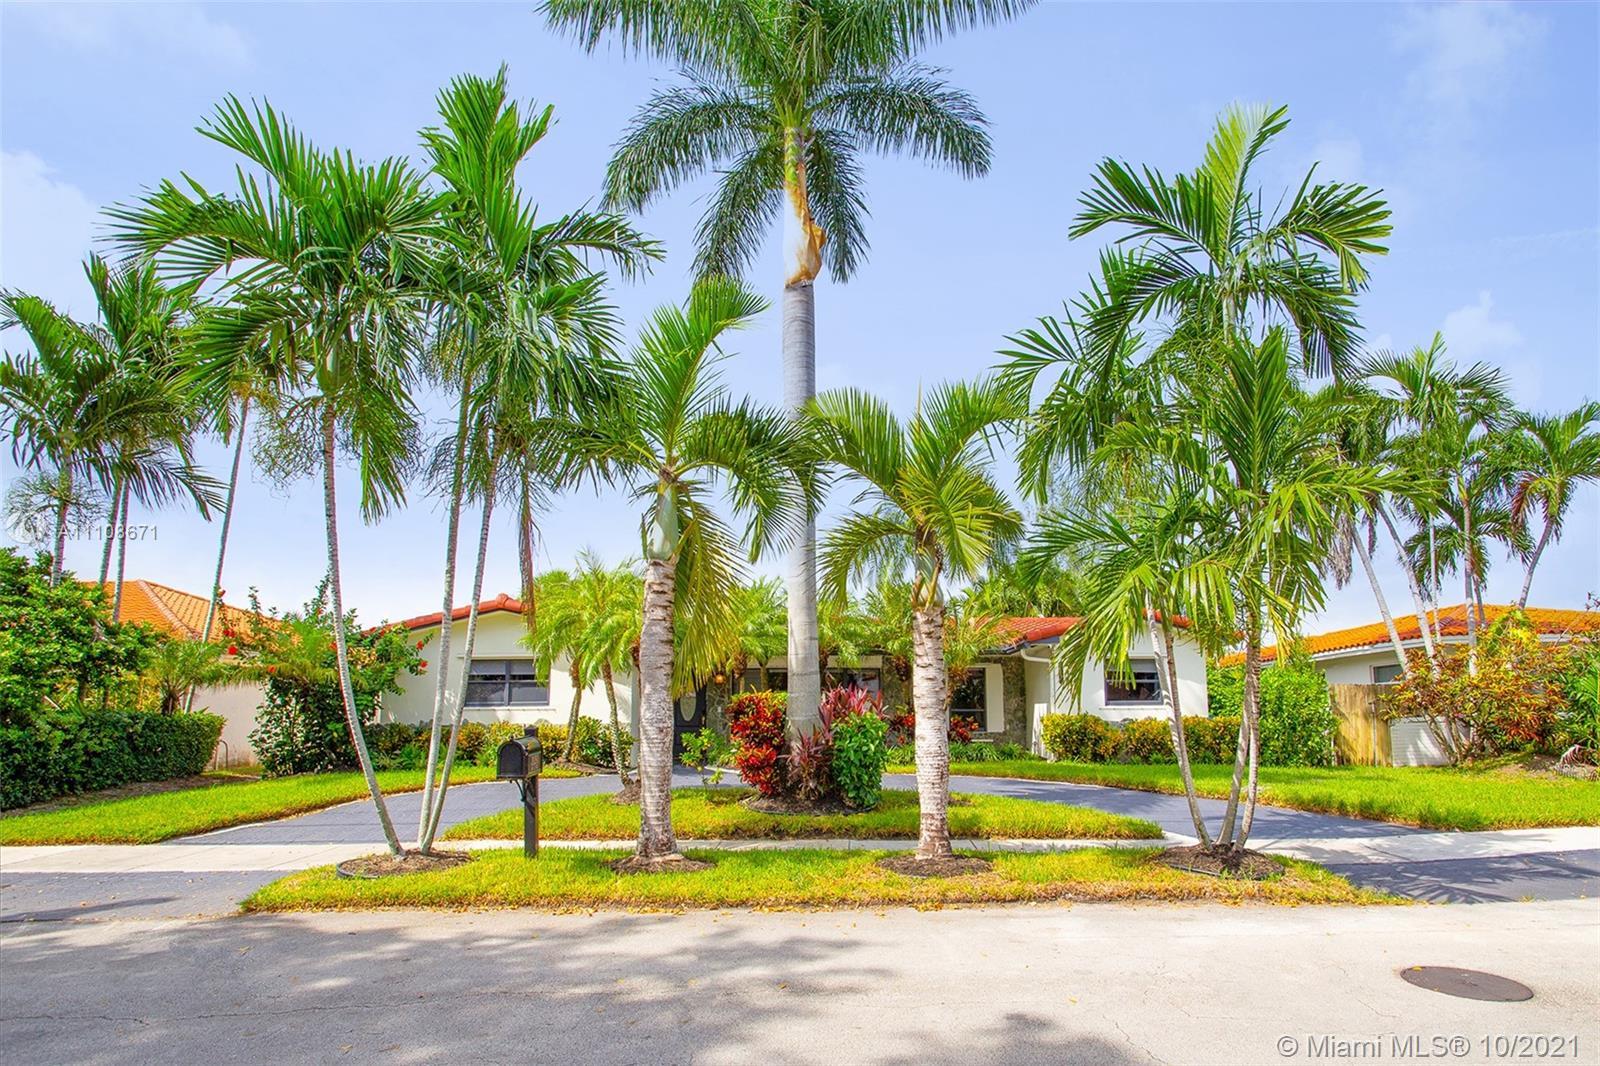 Highland Lakes - 21250 NE 23rd Ave, Miami, FL 33180